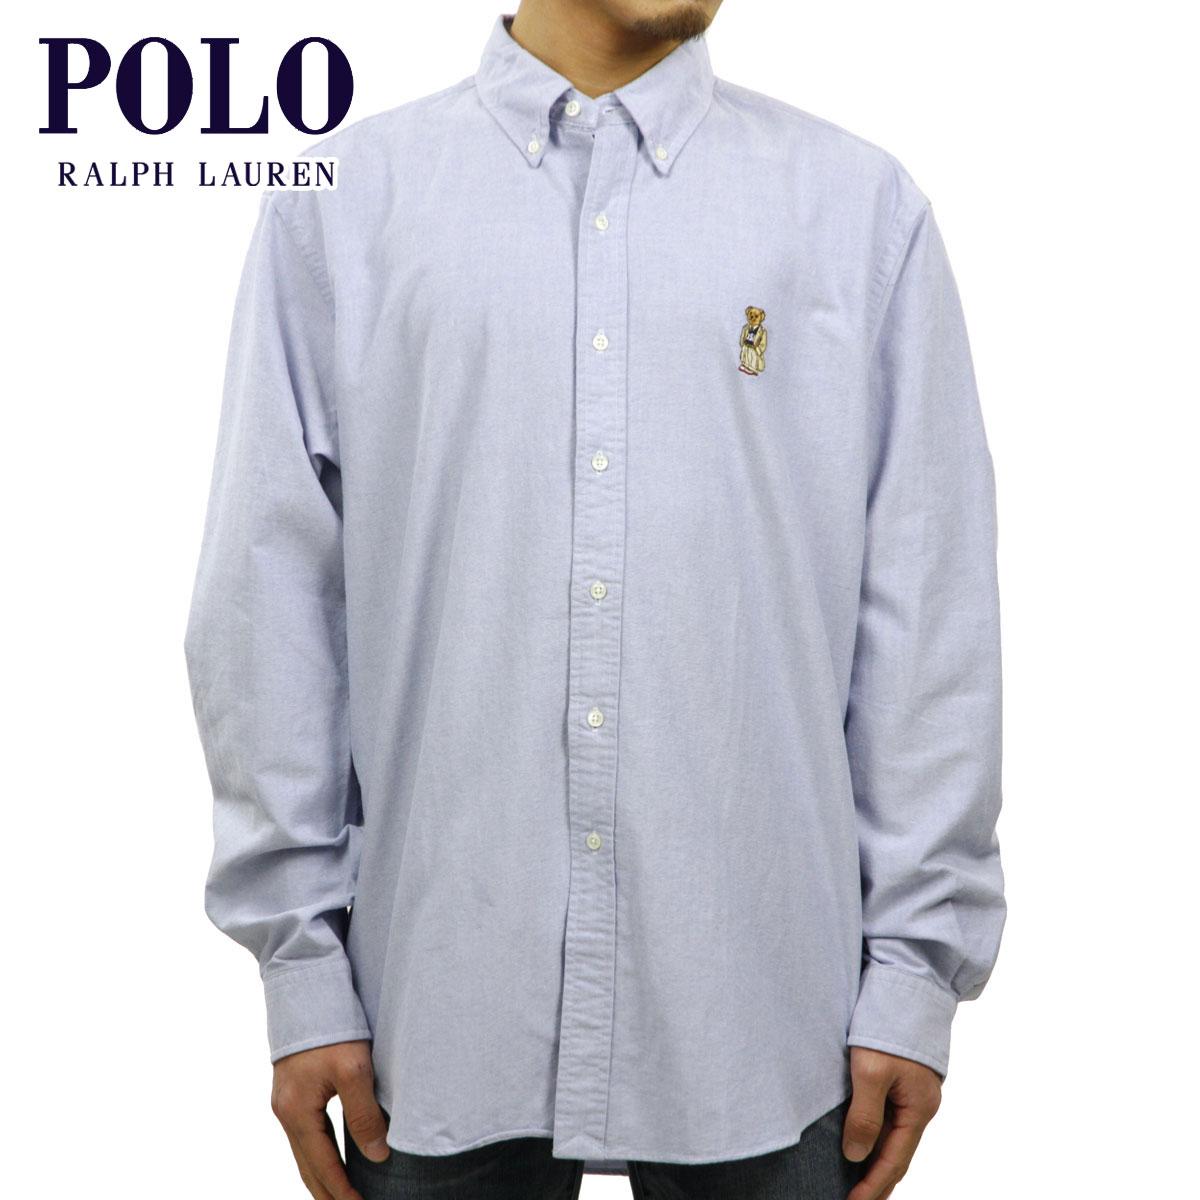 6f3beb65 Rakuten Ichiba shop MIXON: Polo Ralph Lauren POLO RALPH LAUREN regular  article men long sleeves shirt Long-Sleeve Oxford Polo Bear Shirt D20S30 |  Rakuten ...